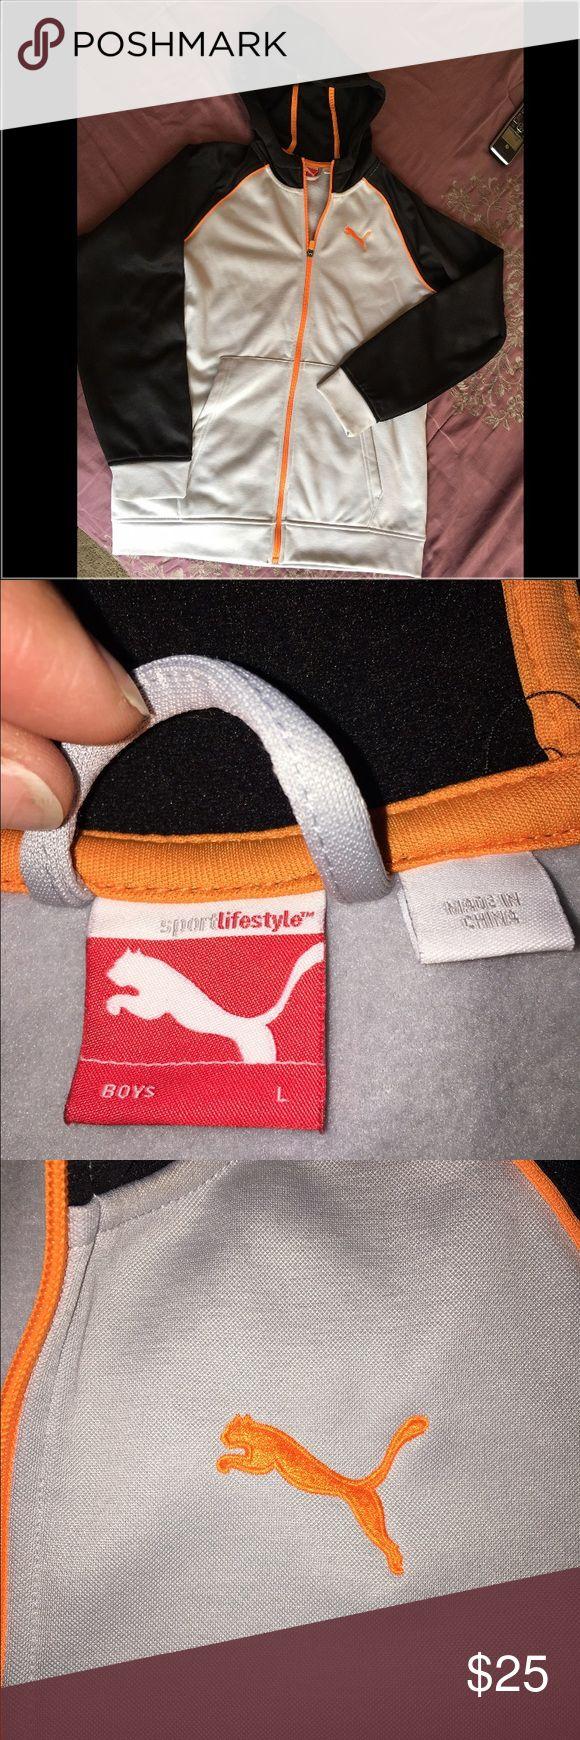 Puma Sweatshirt Puma Lightweight zippered sweatshirt. Gray/Black/Orange. In like-new condition Puma Shirts & Tops Sweatshirts & Hoodies